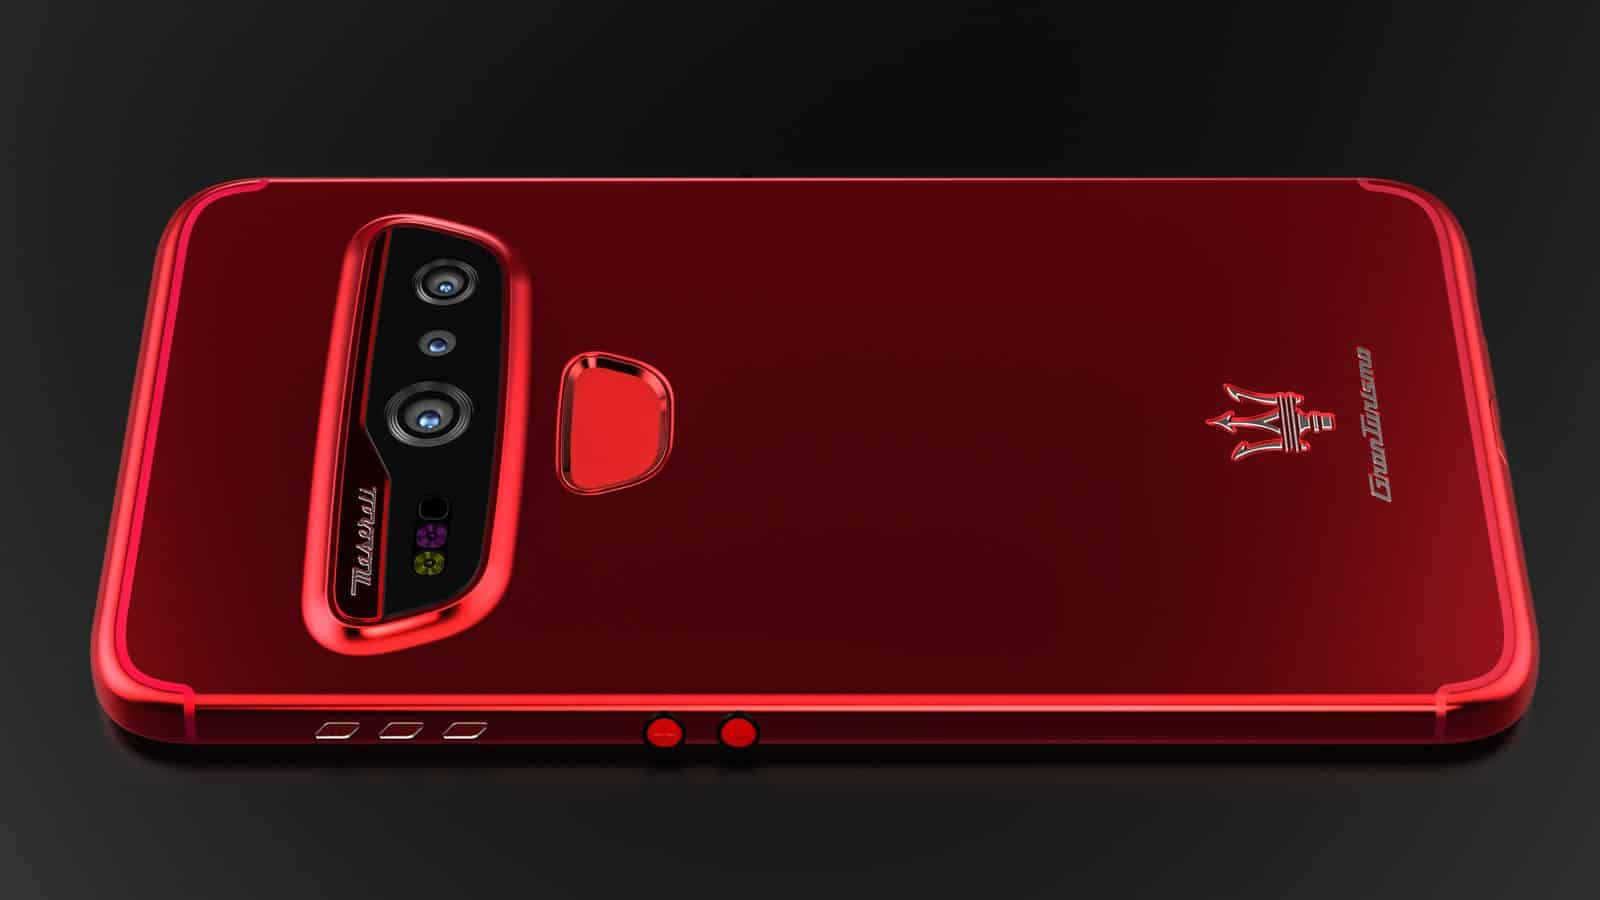 Maserati GranTurismo Concept Phone 2